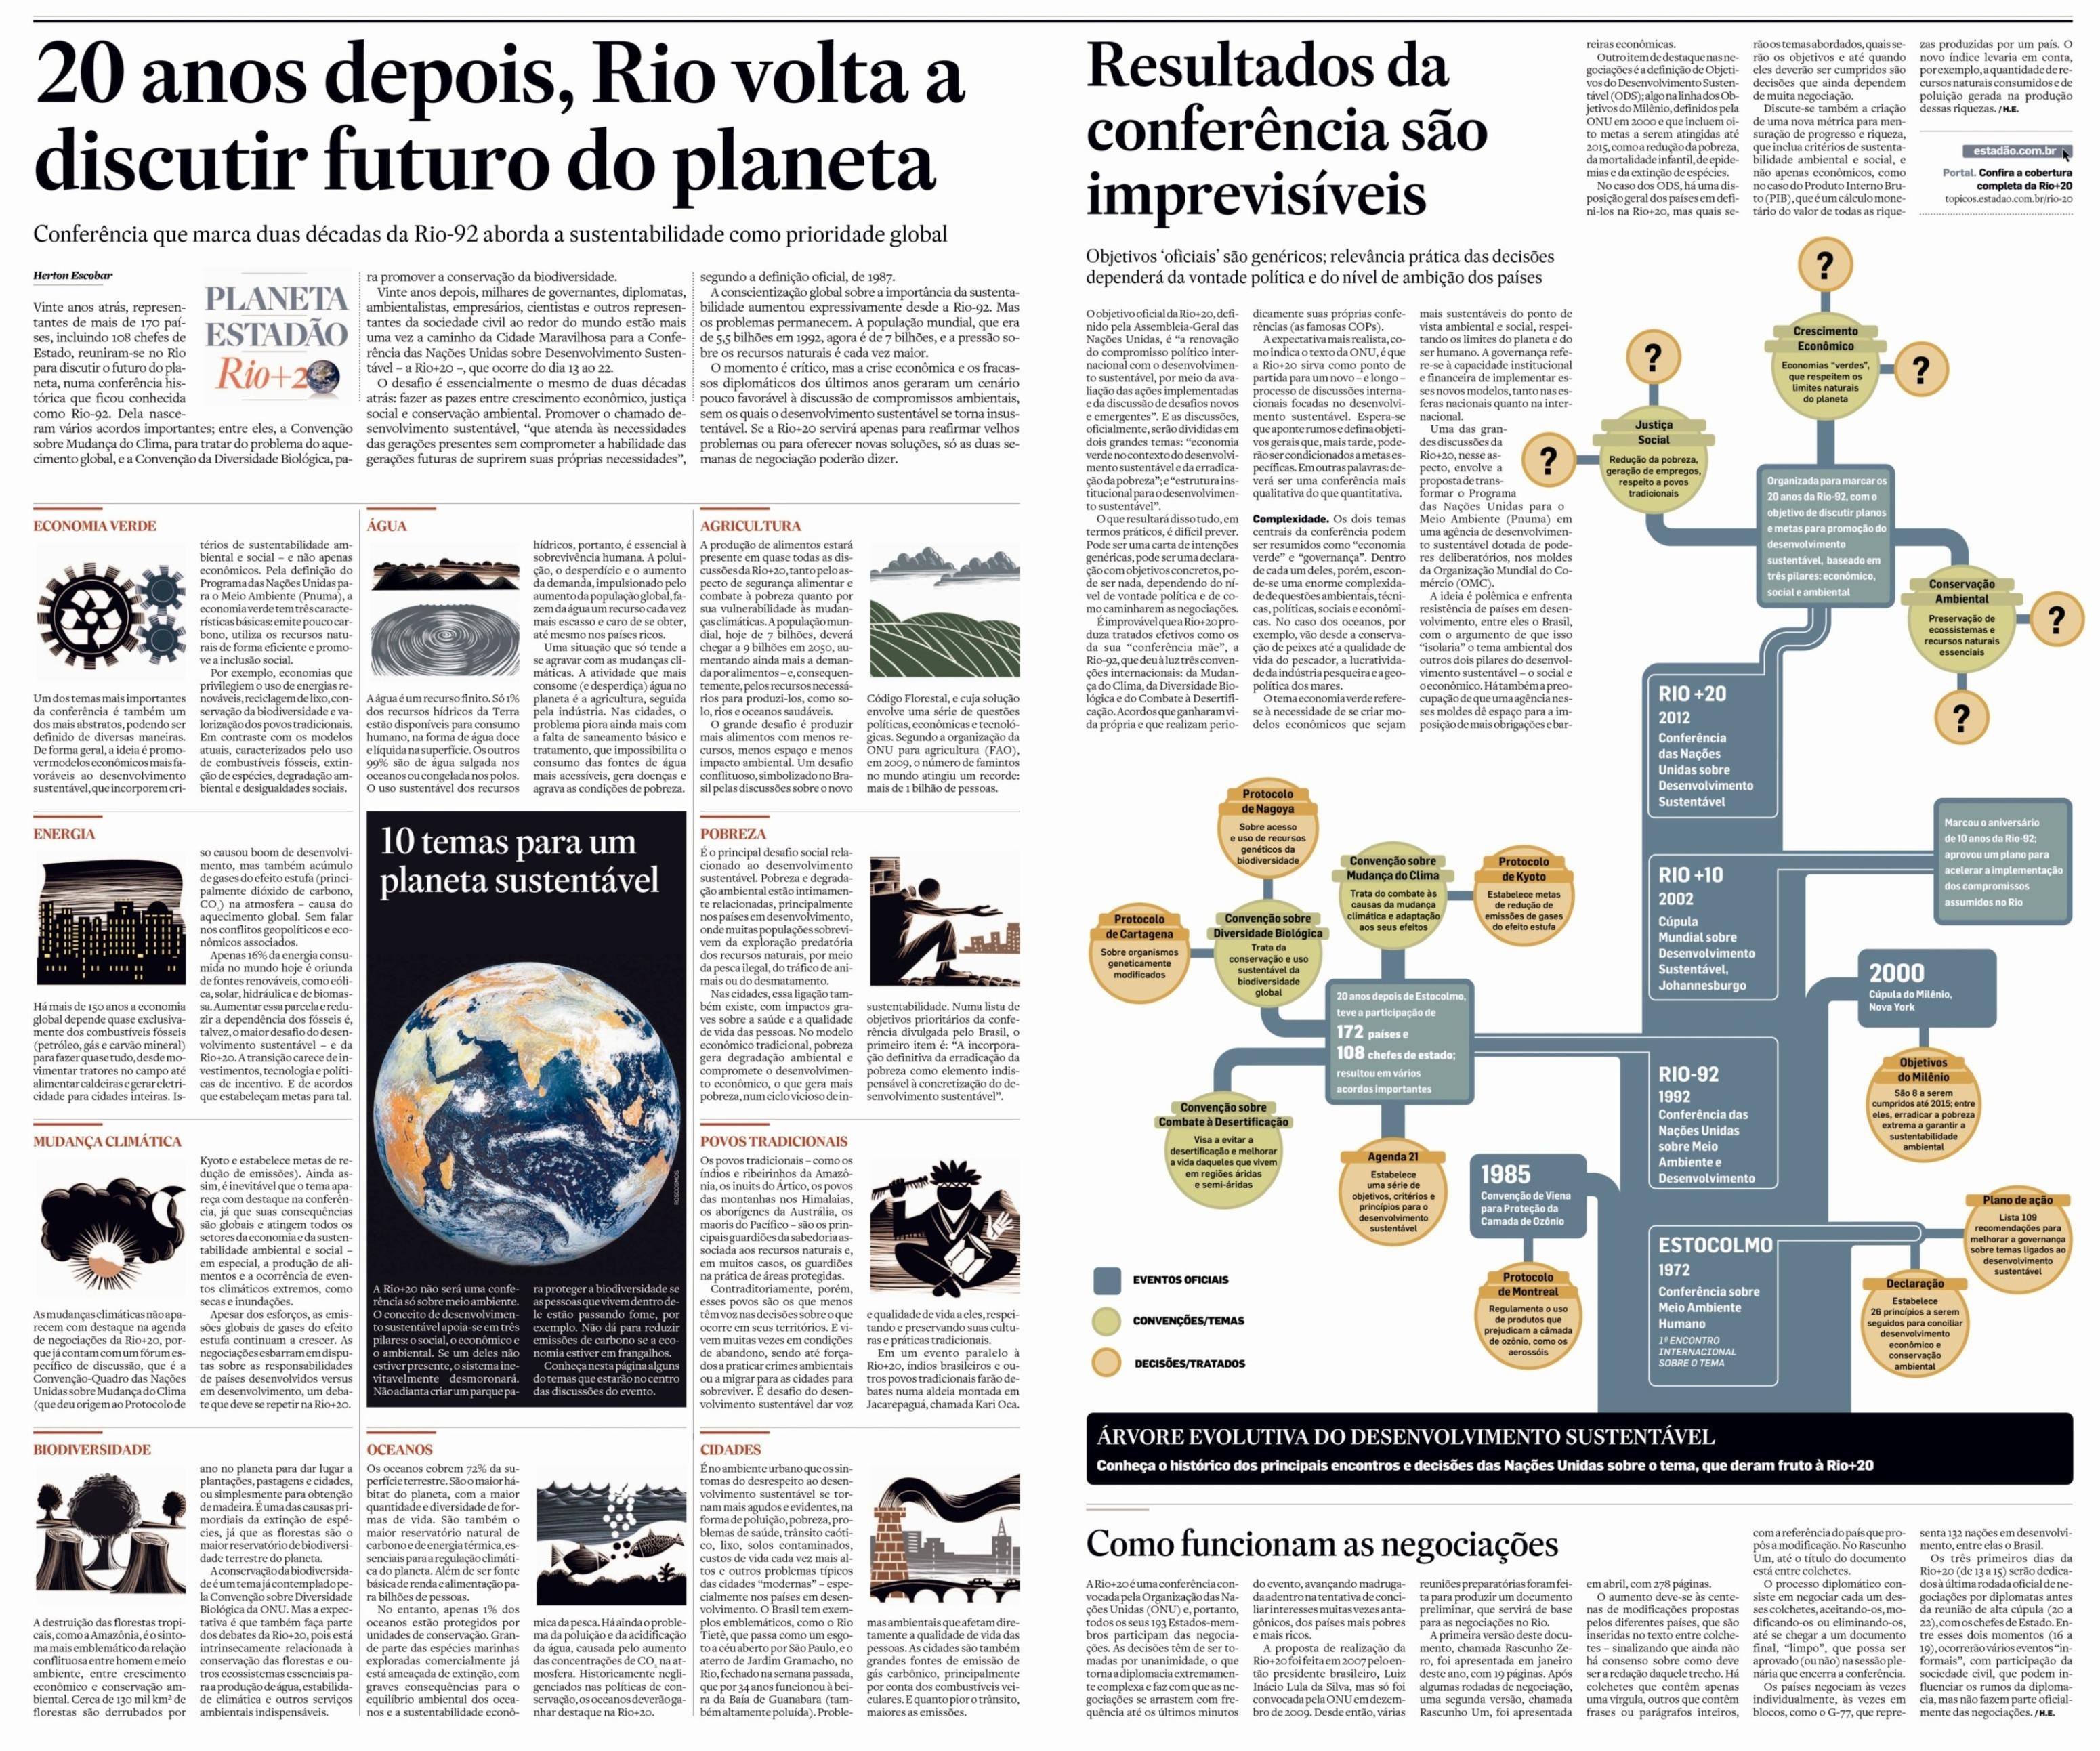 Rio+20: 20 anos depois, Rio volta a discutir futuro do planeta